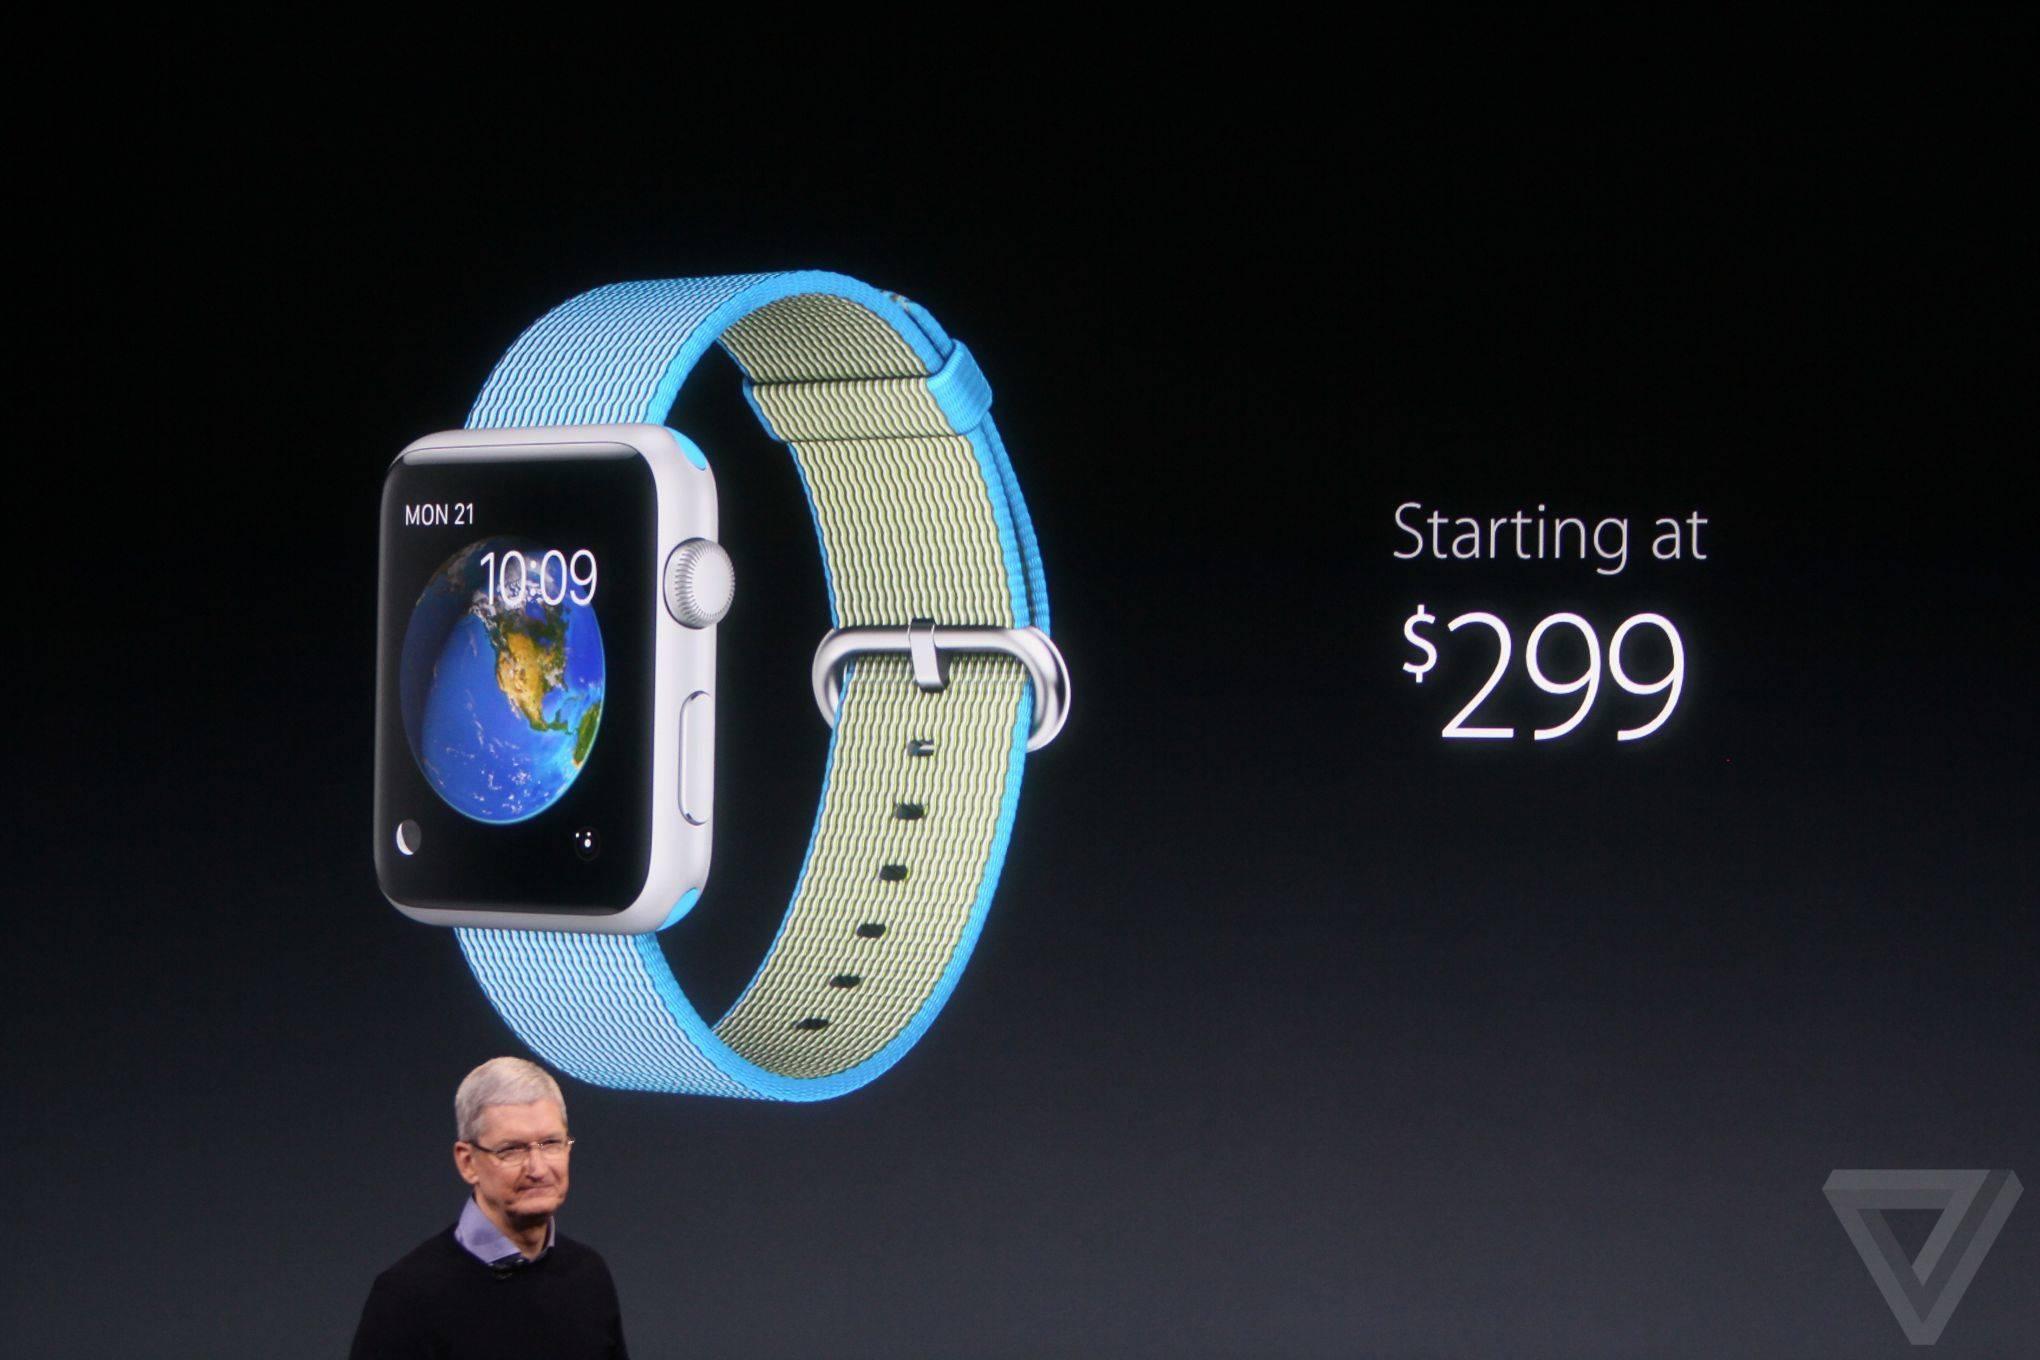 apple-iphone-se-ipad-pro-event-verge-254